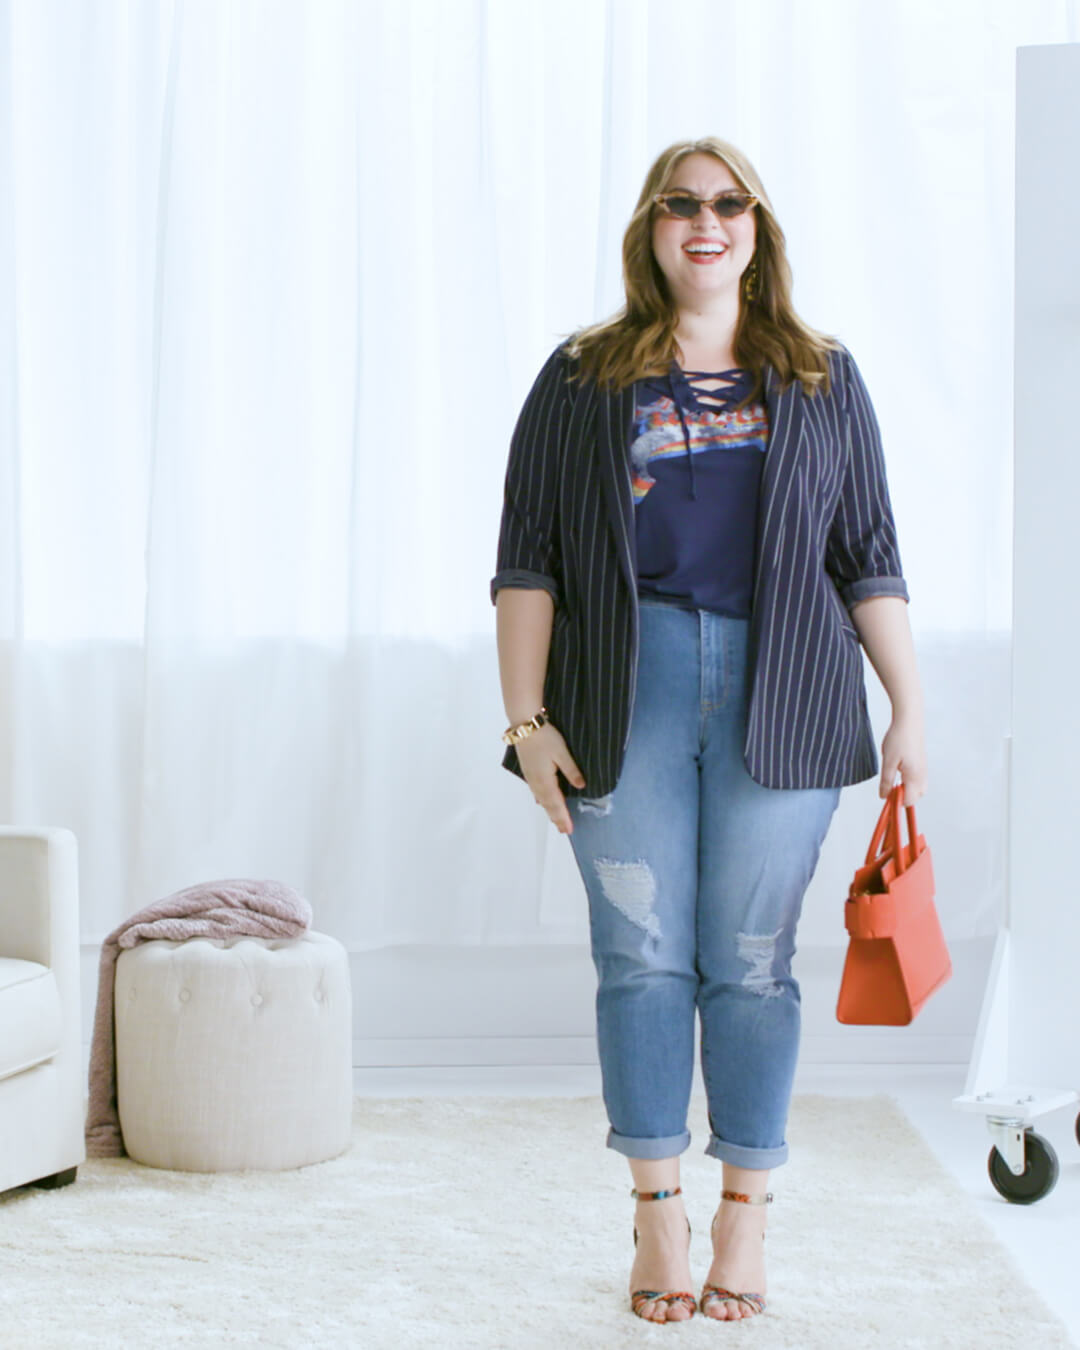 plus-size blazer over graphic tee distressed denim sunglasses bright bag